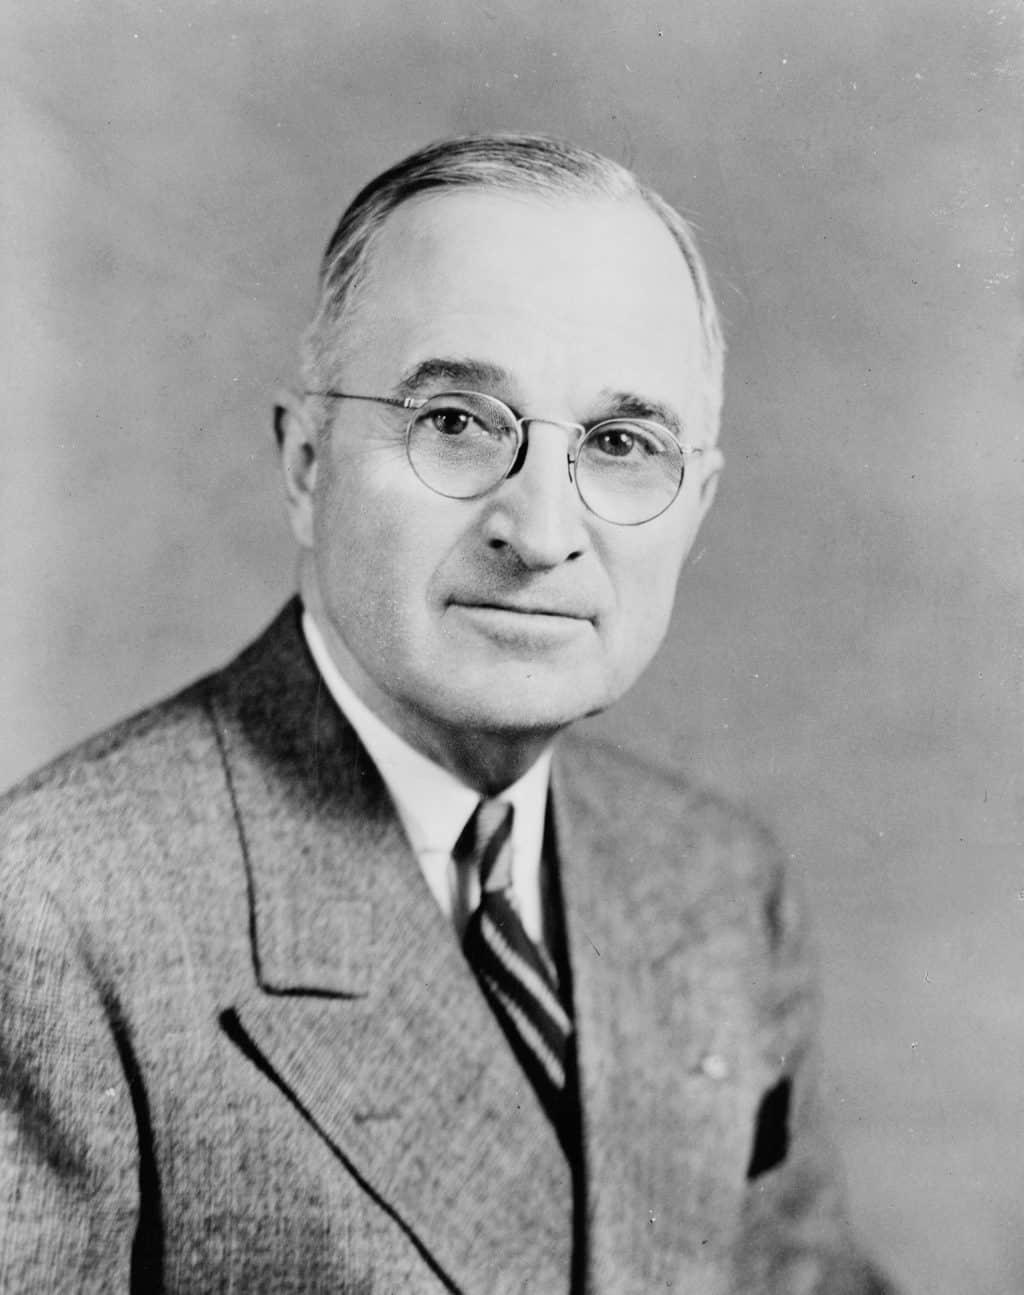 Truman main